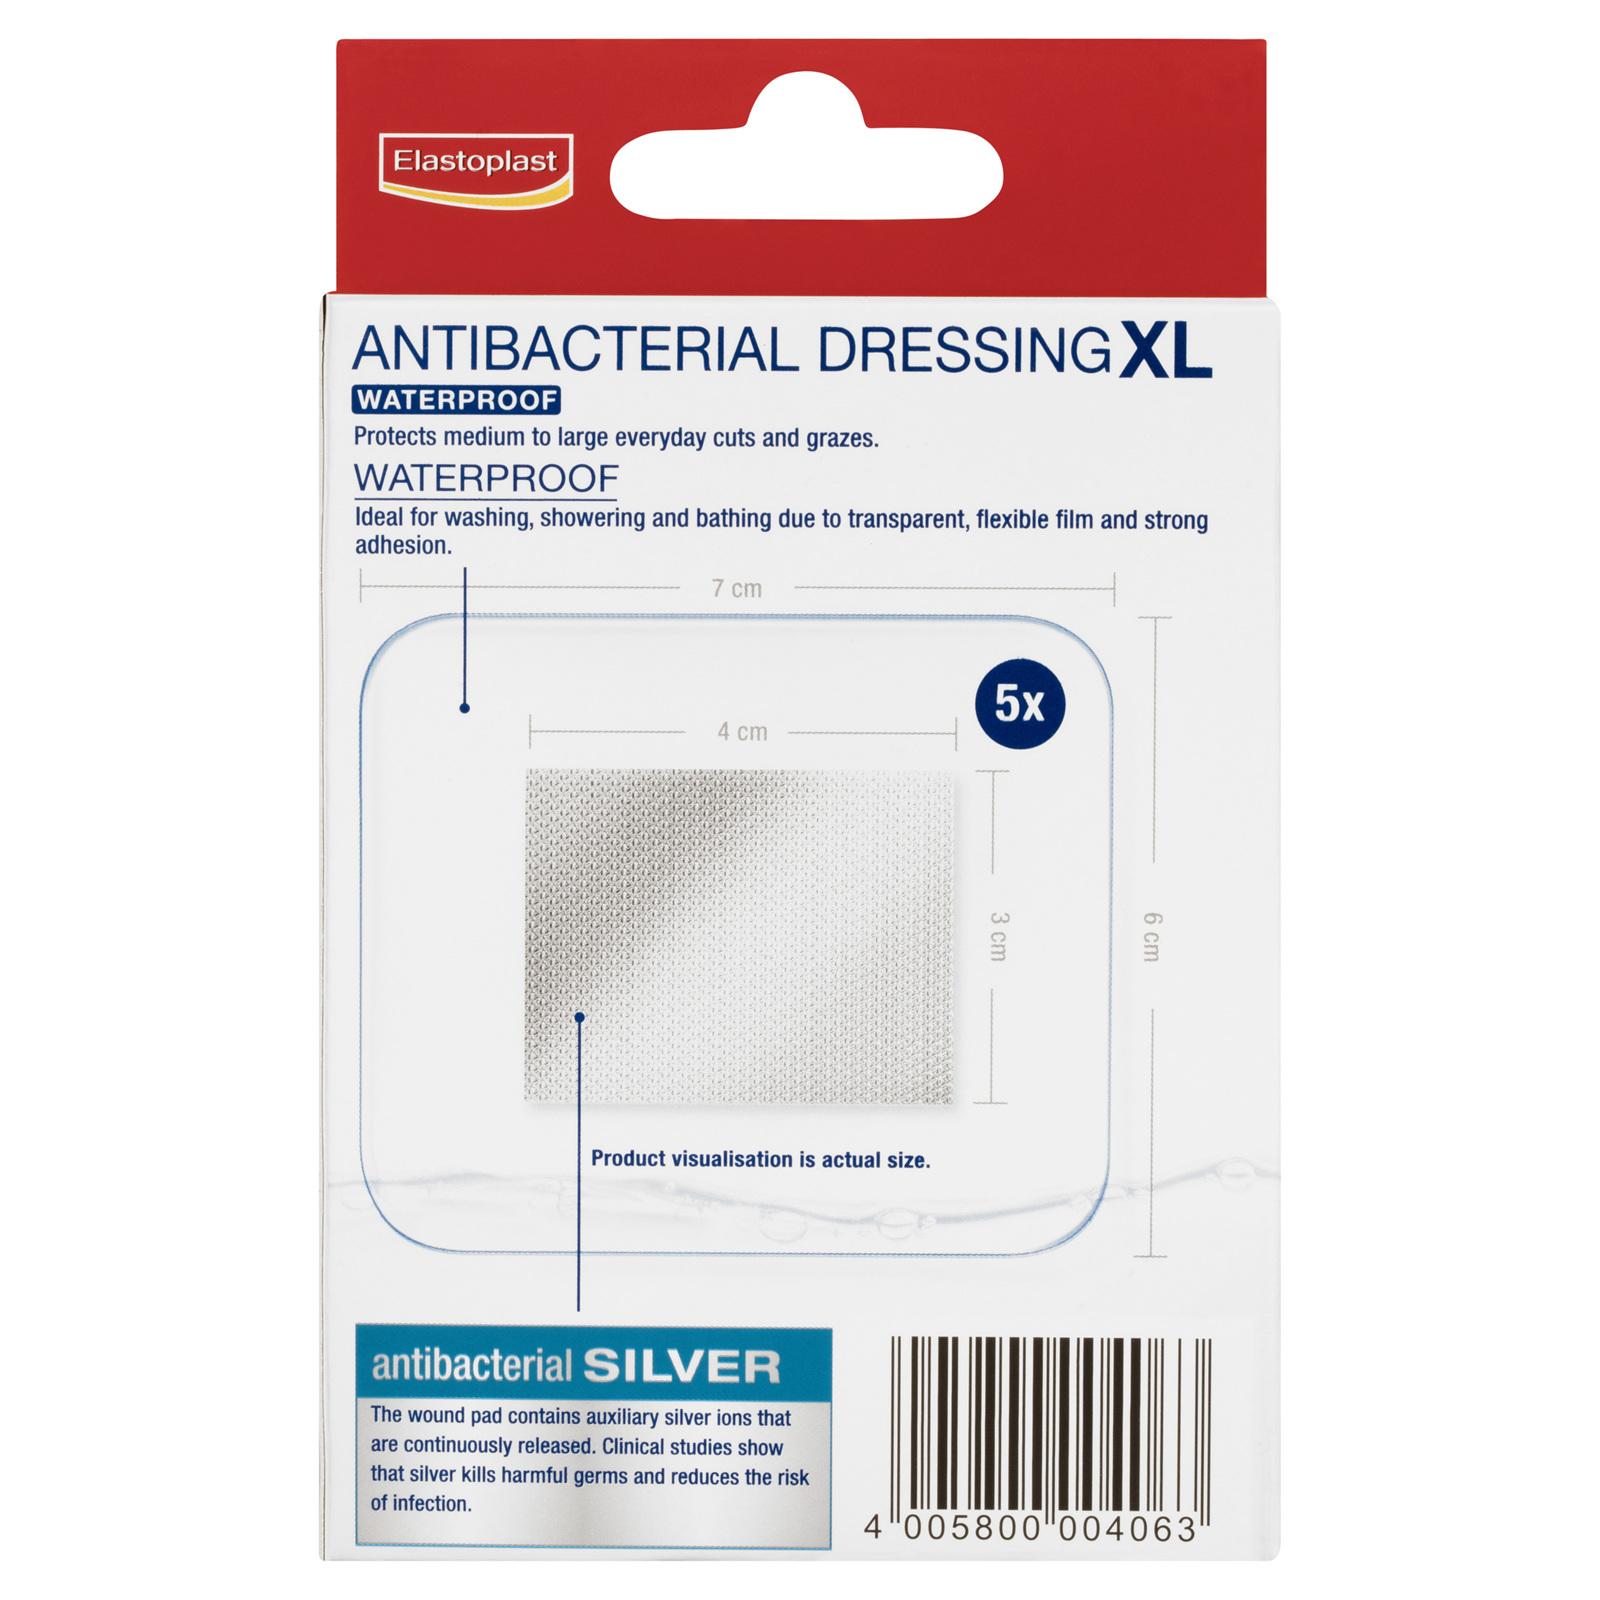 Elastoplast Antibacterial XL Waterproof - Bay Health